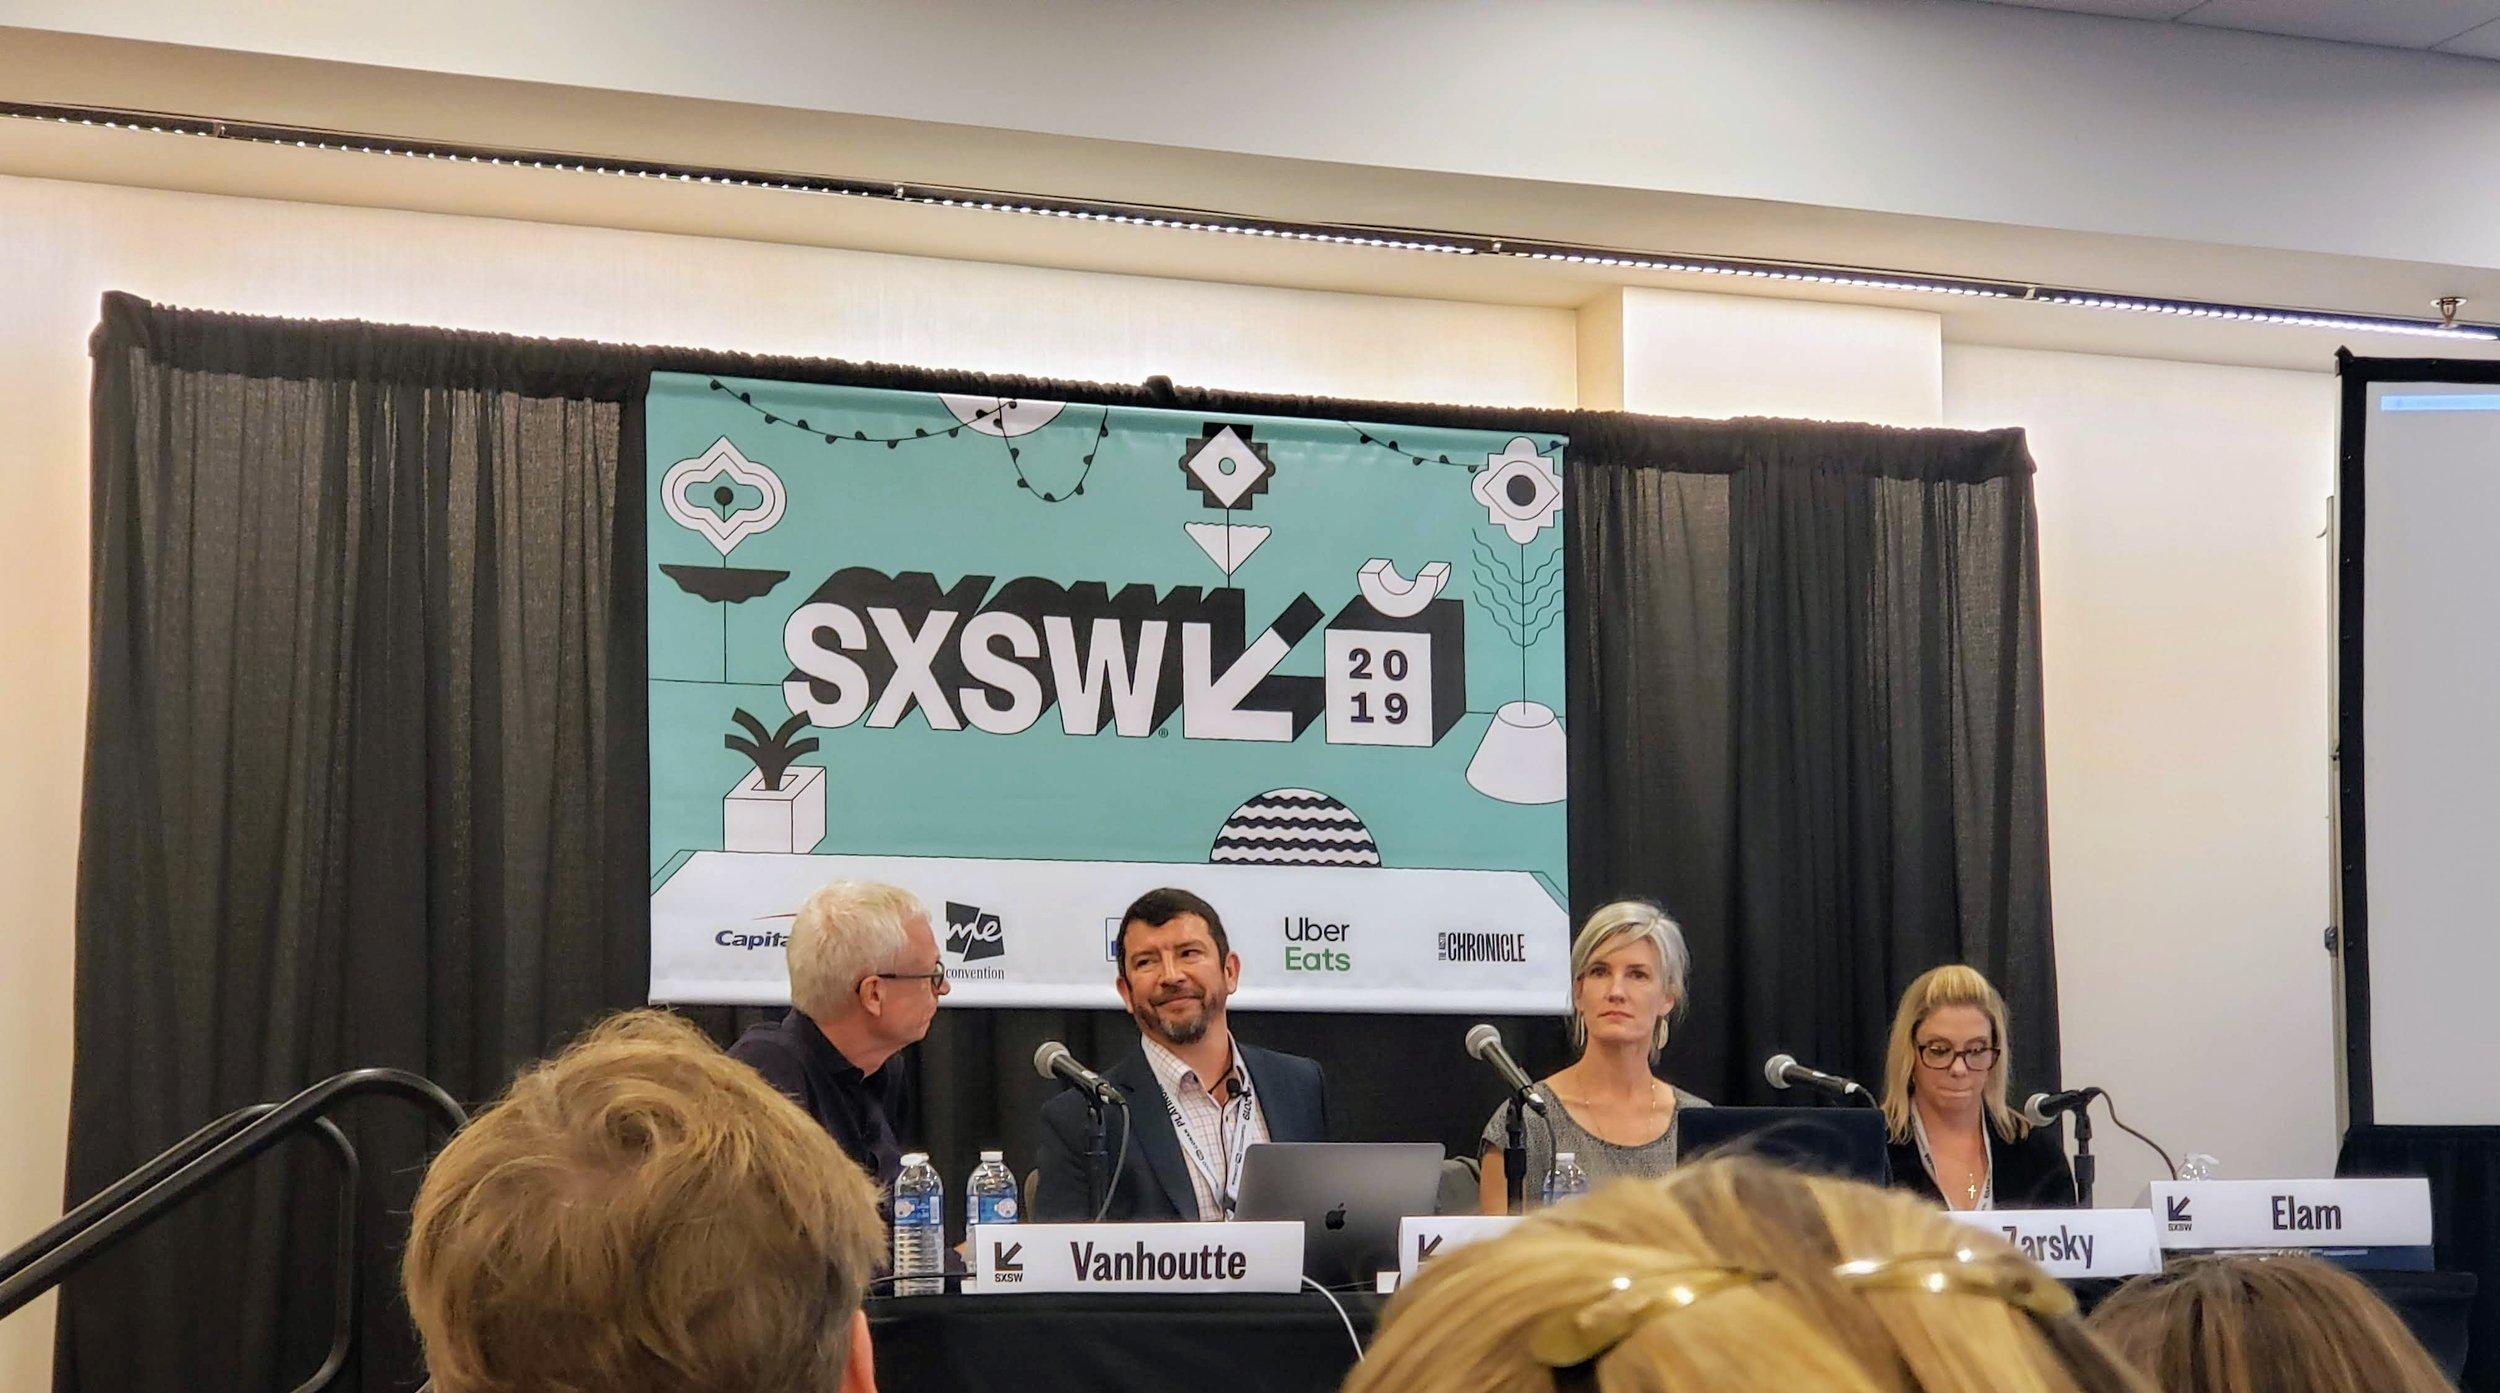 Philip moderating Nature at Work panel at SXSW 2019 with Rolando Balli, Kathy Zarsky and Liz Elam